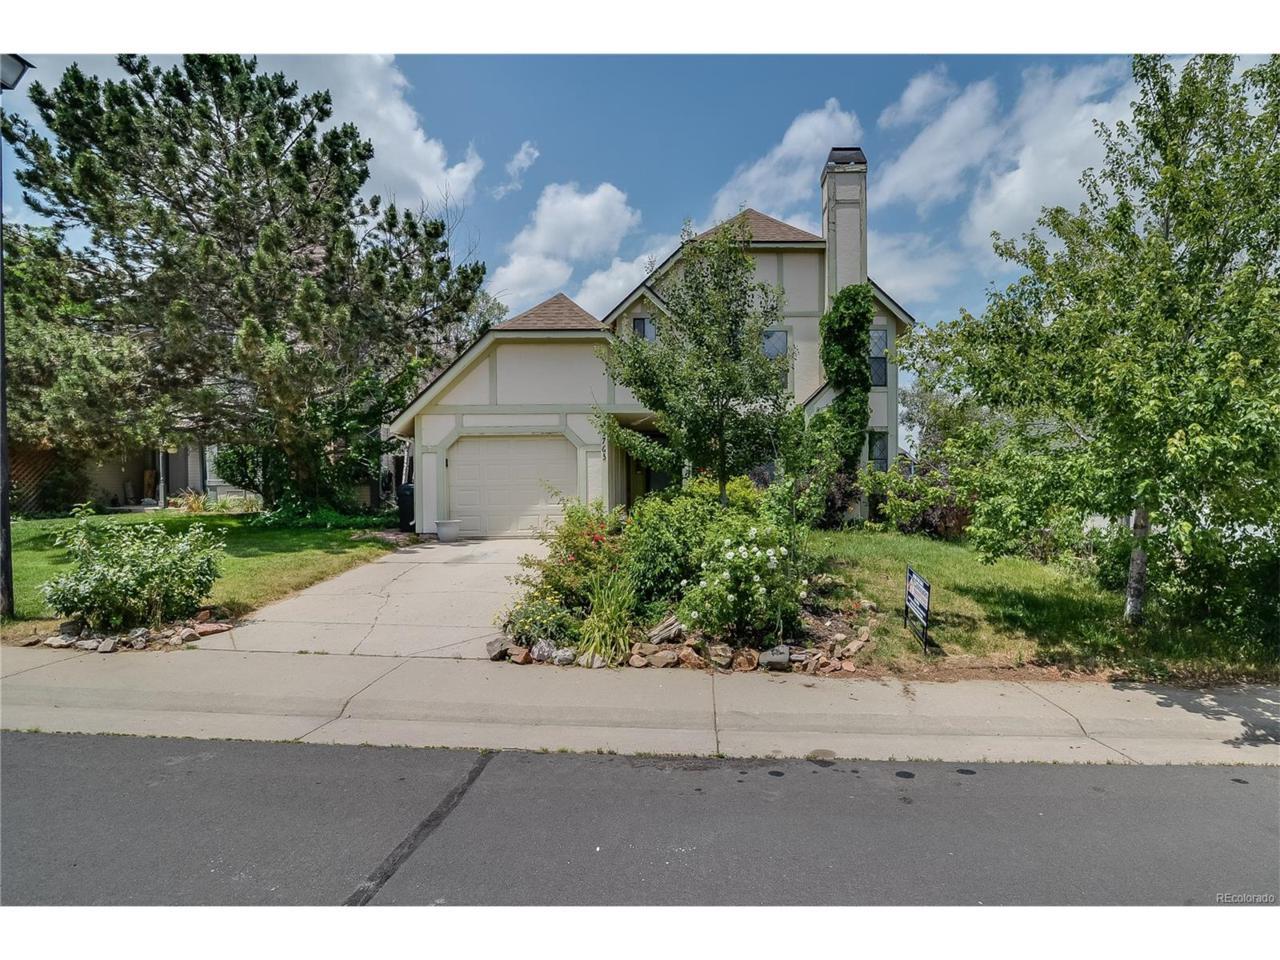 4763 S Yampa Street, Aurora, CO 80015 (MLS #6961970) :: 8z Real Estate